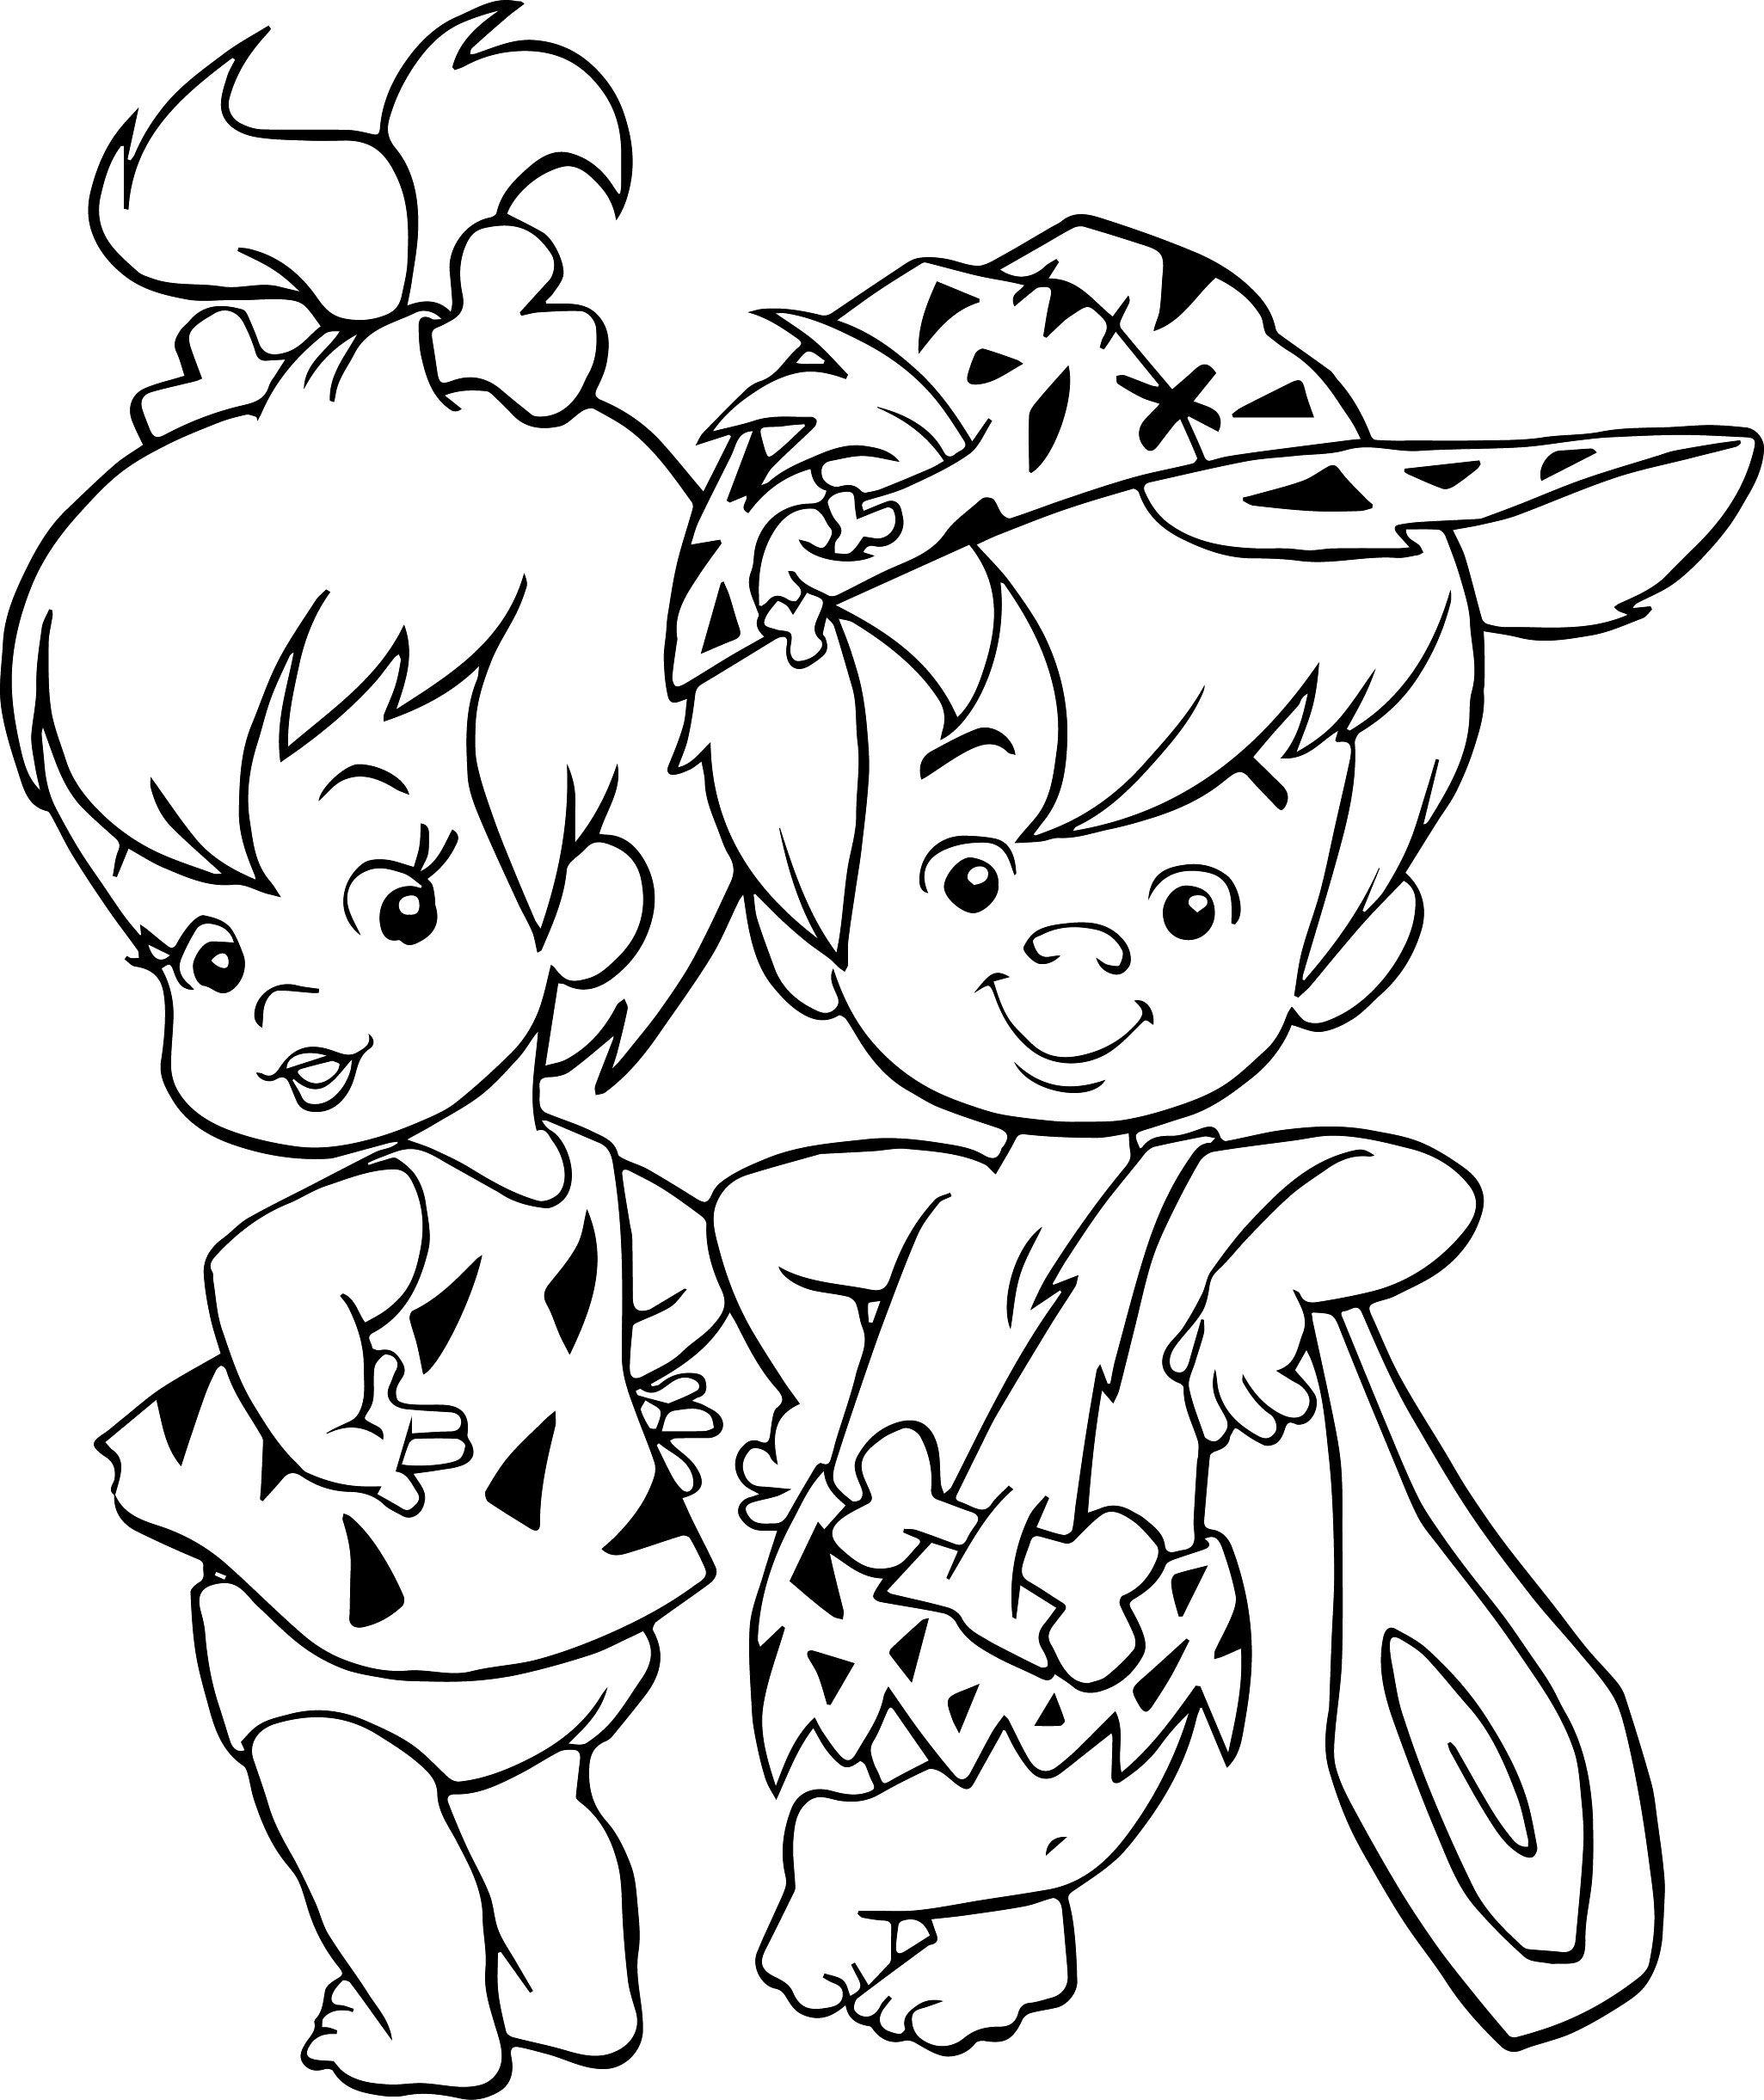 The Flintstones Baby Girl Pebbles Baby Boy Bamm Bamm Rubble Coloring ...